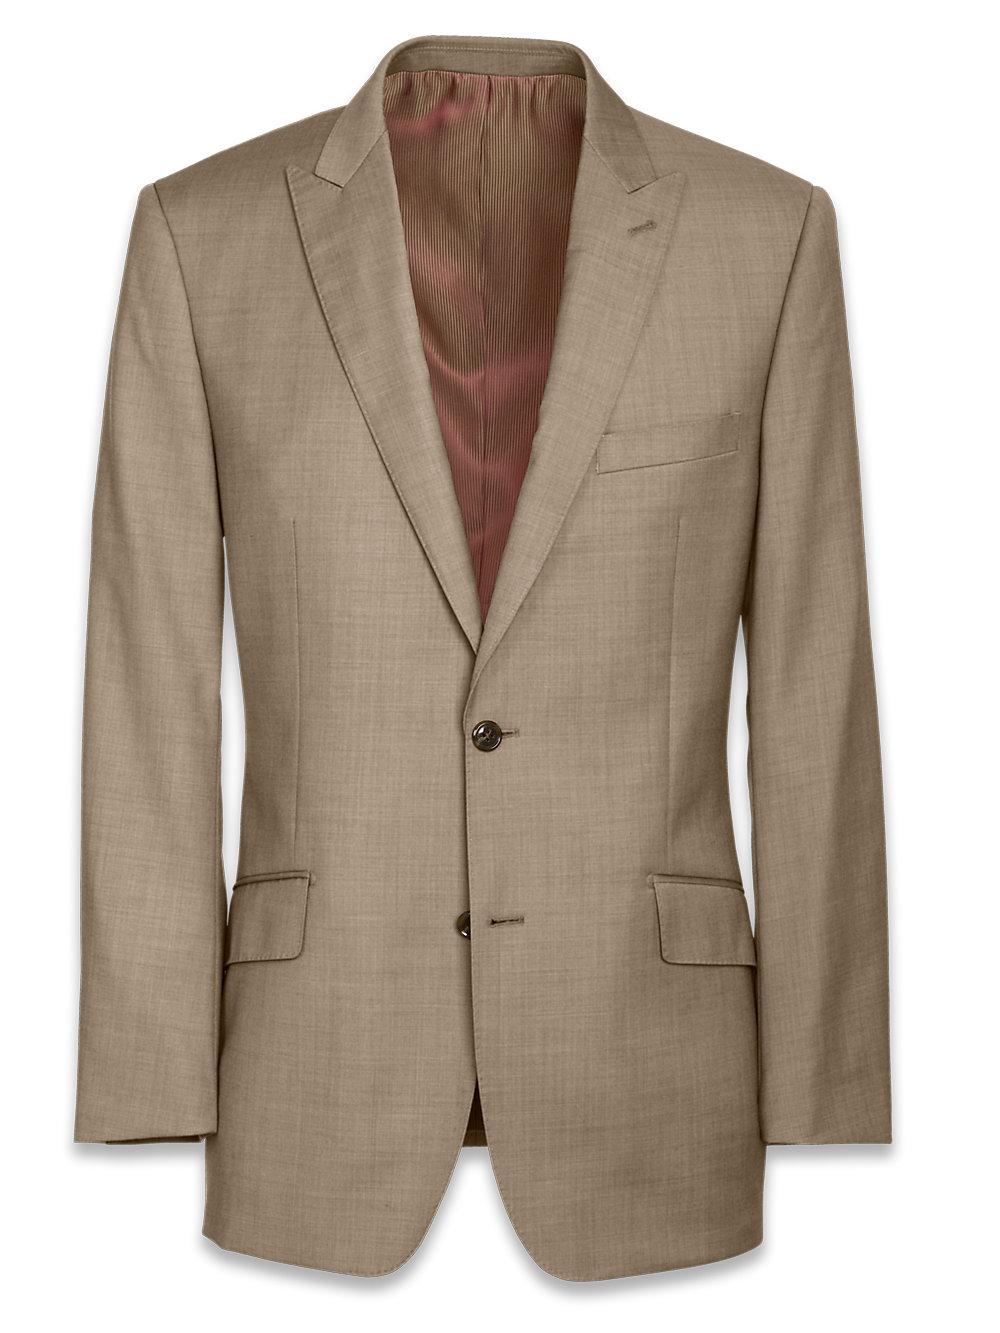 Paul Fredrick Mens Super 120s Sharkskin Notch Lapel Suit